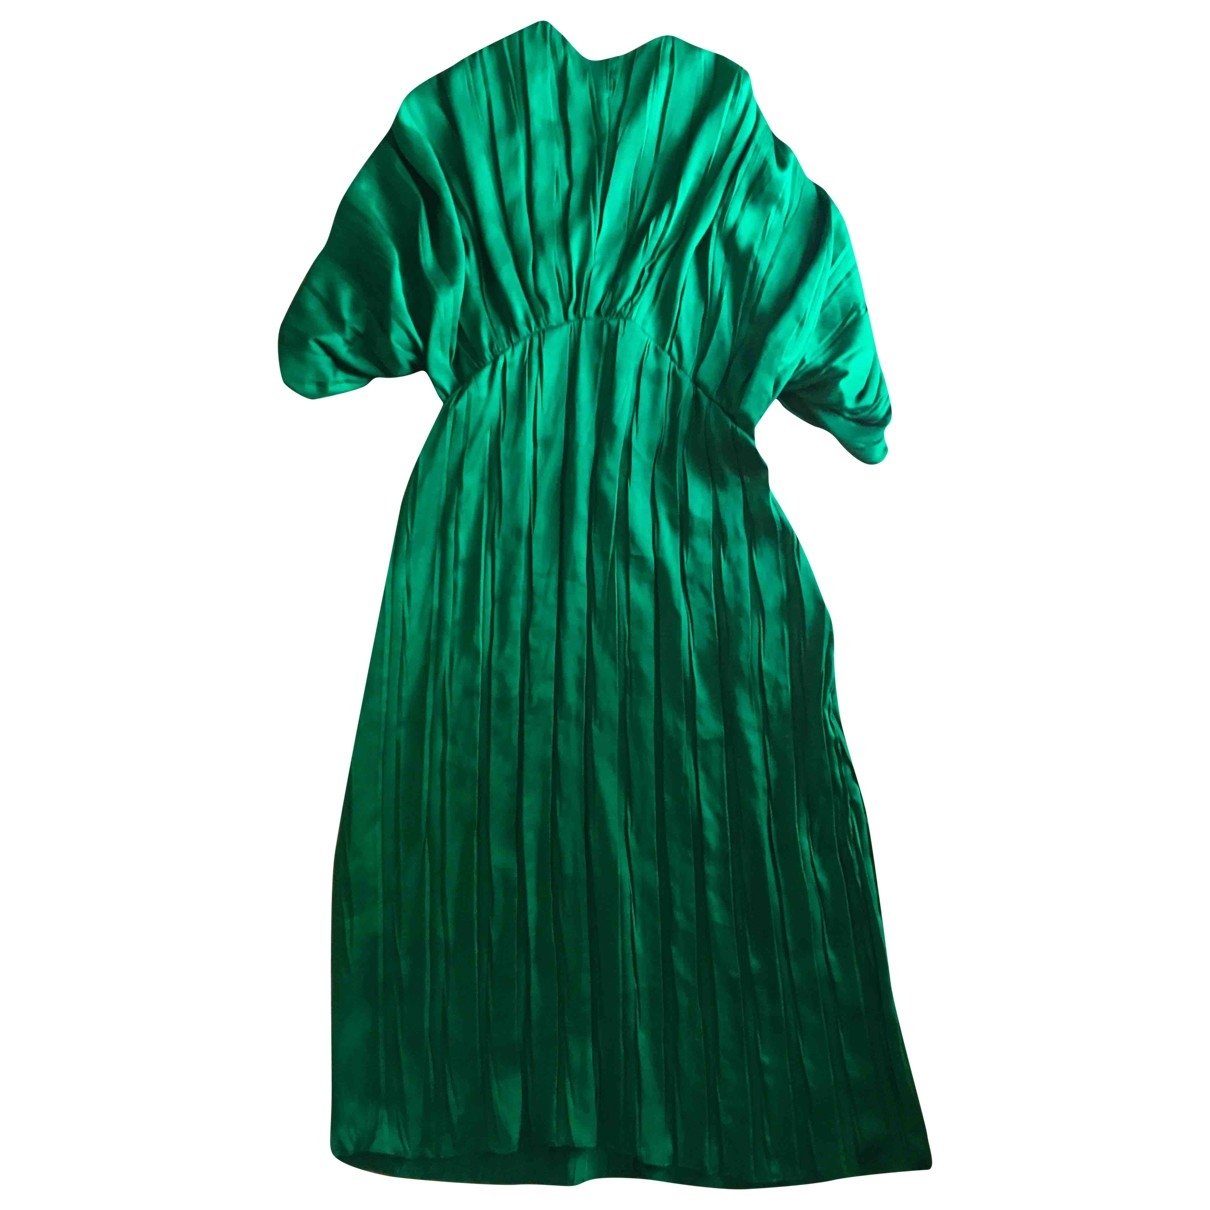 Zara \N Green dress for Women XS International